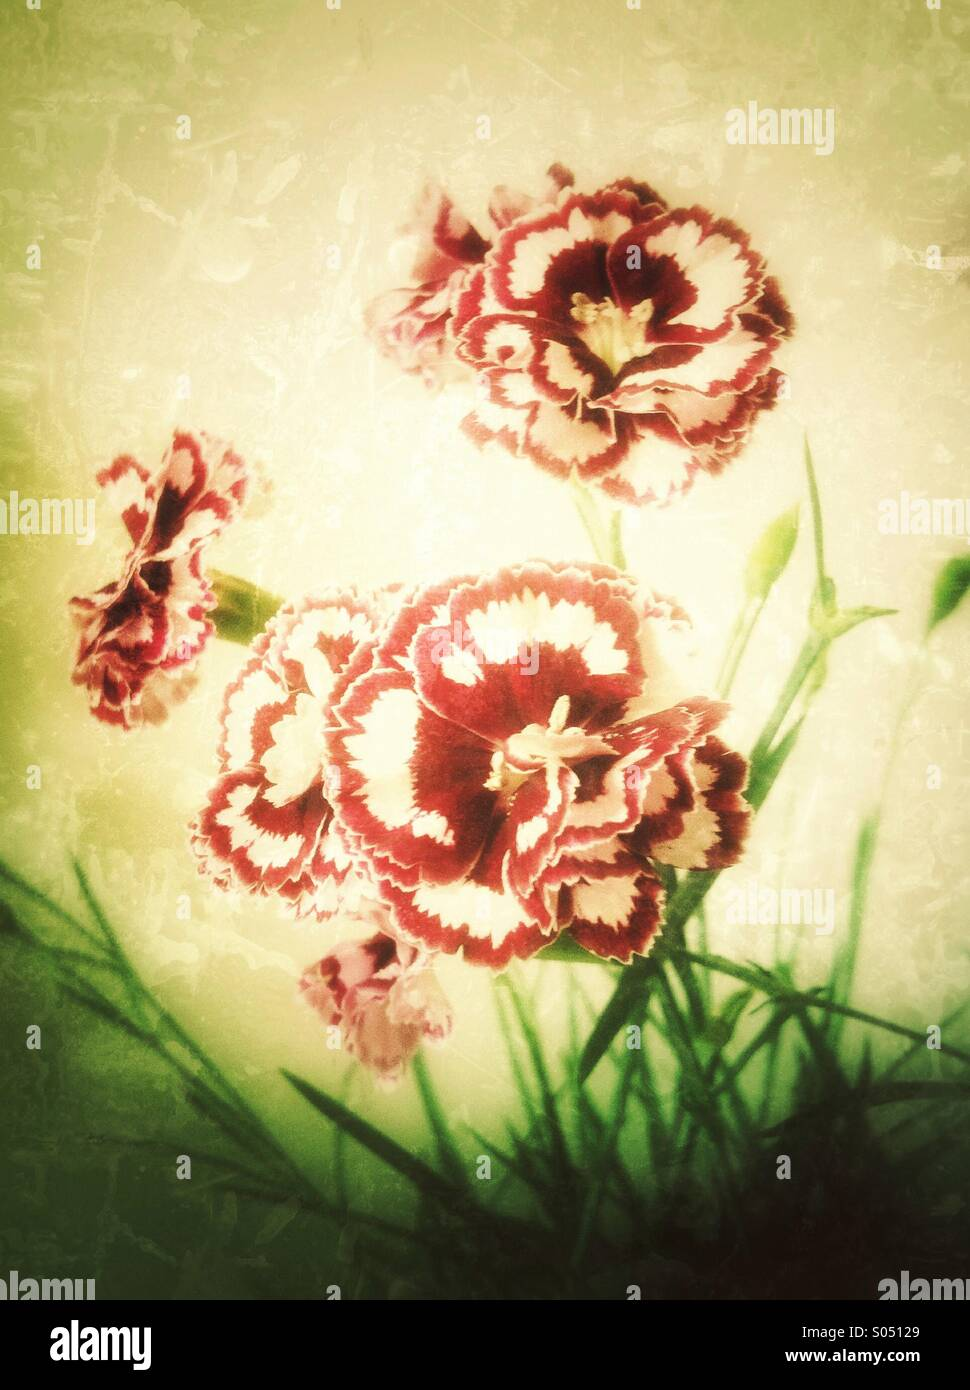 Rosso Bianco dianthus fiori Immagini Stock